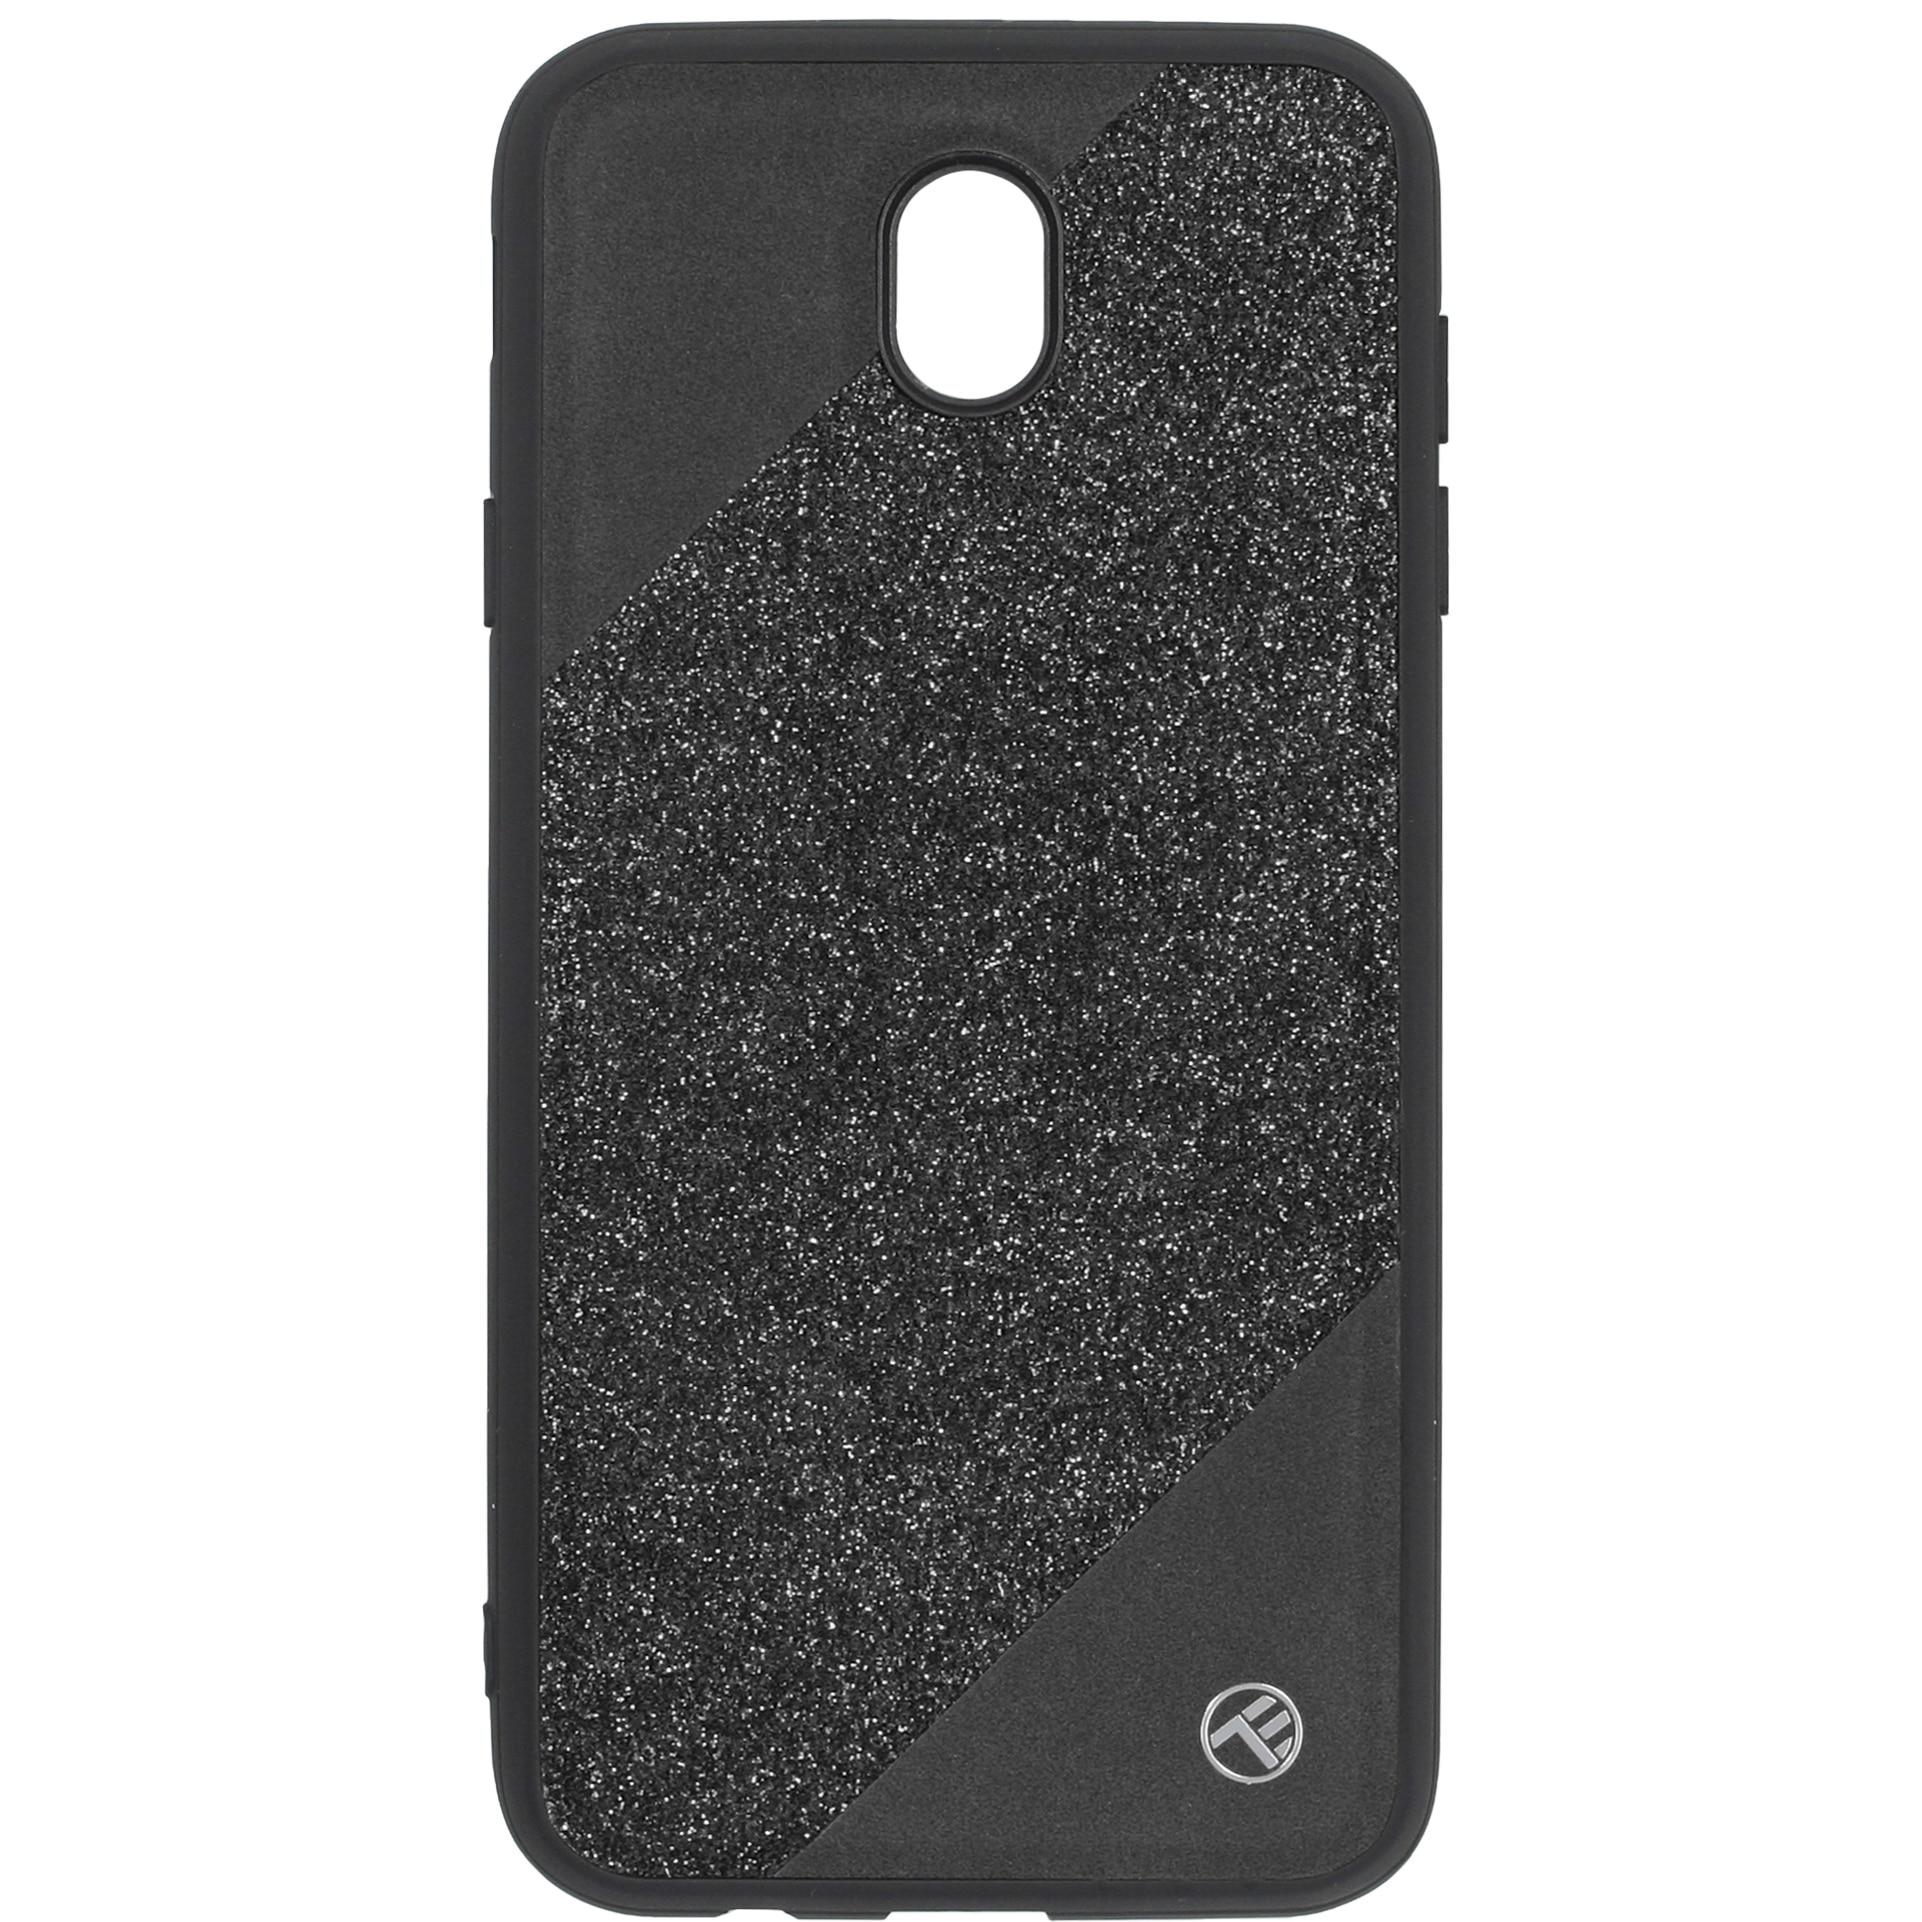 Fotografie Husa de protectie Tellur Glitter III pentru Samsung Galaxy J7 2017, Black